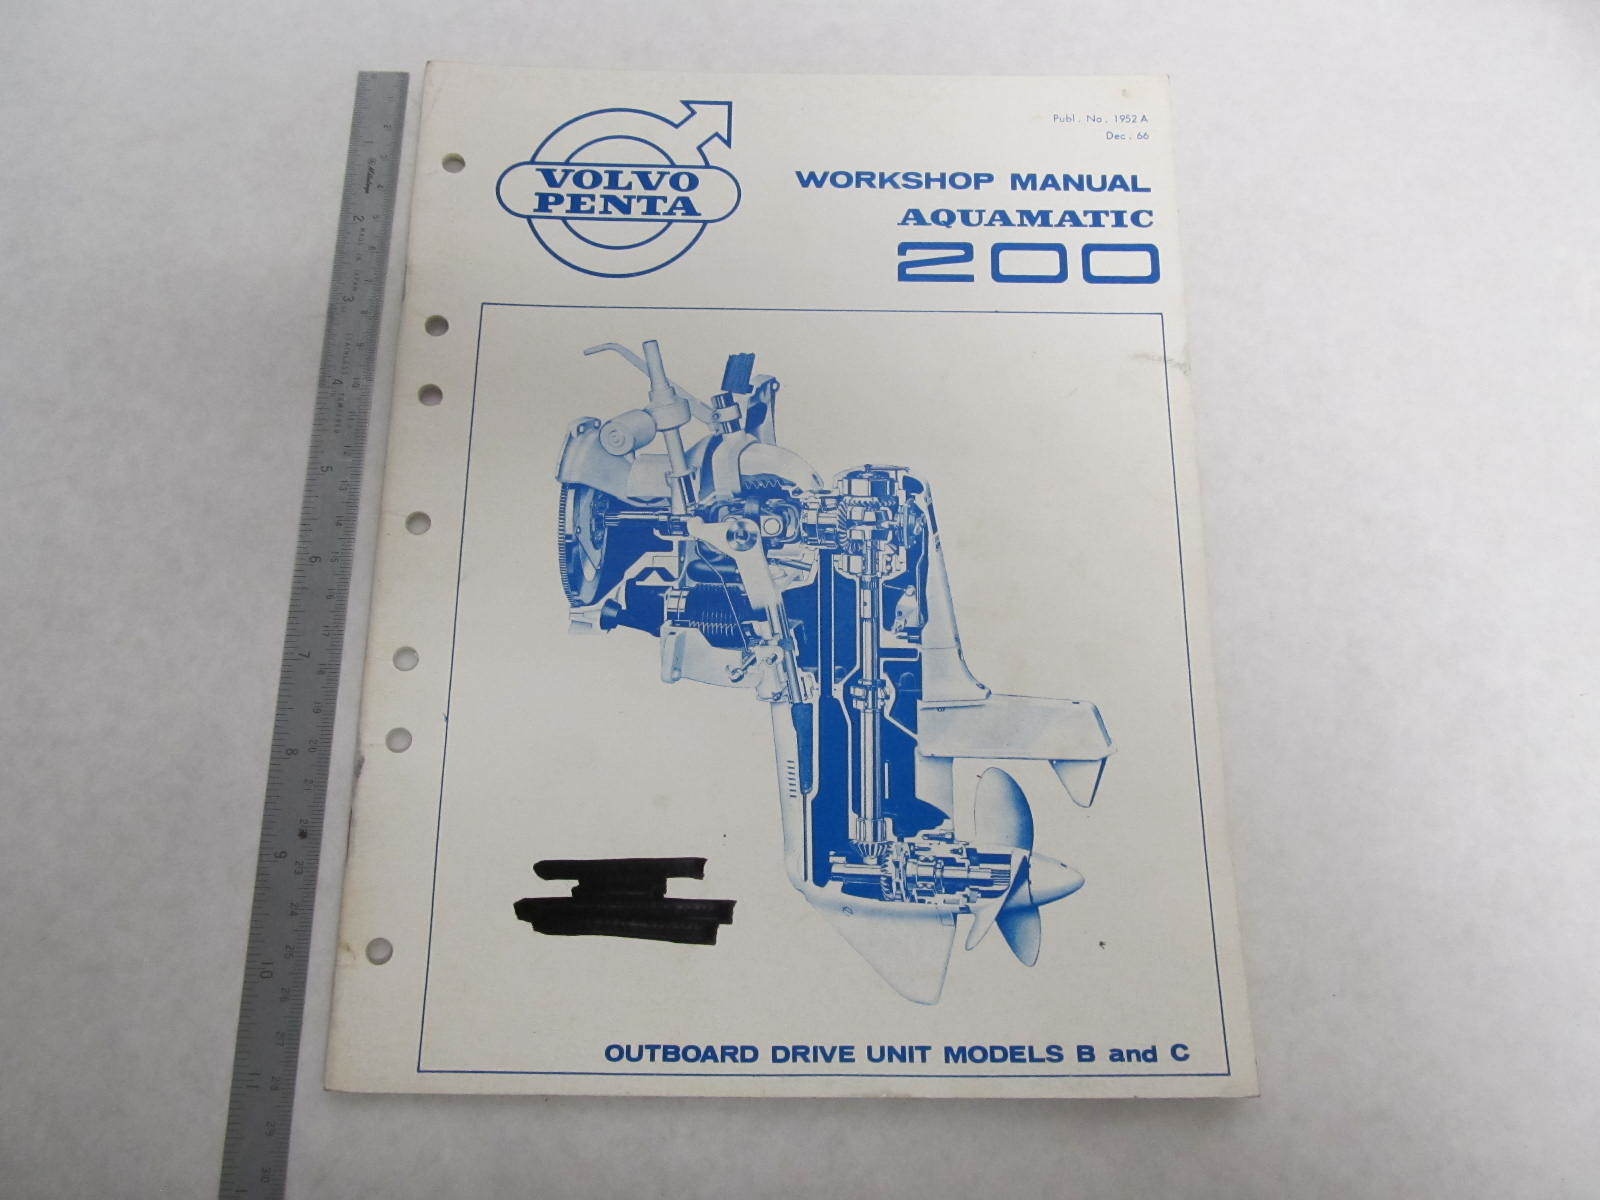 1952a 1966 volvo penta aquamatic 200 service workshop Volvo Penta Parts Volvo Penta Engine Manuals